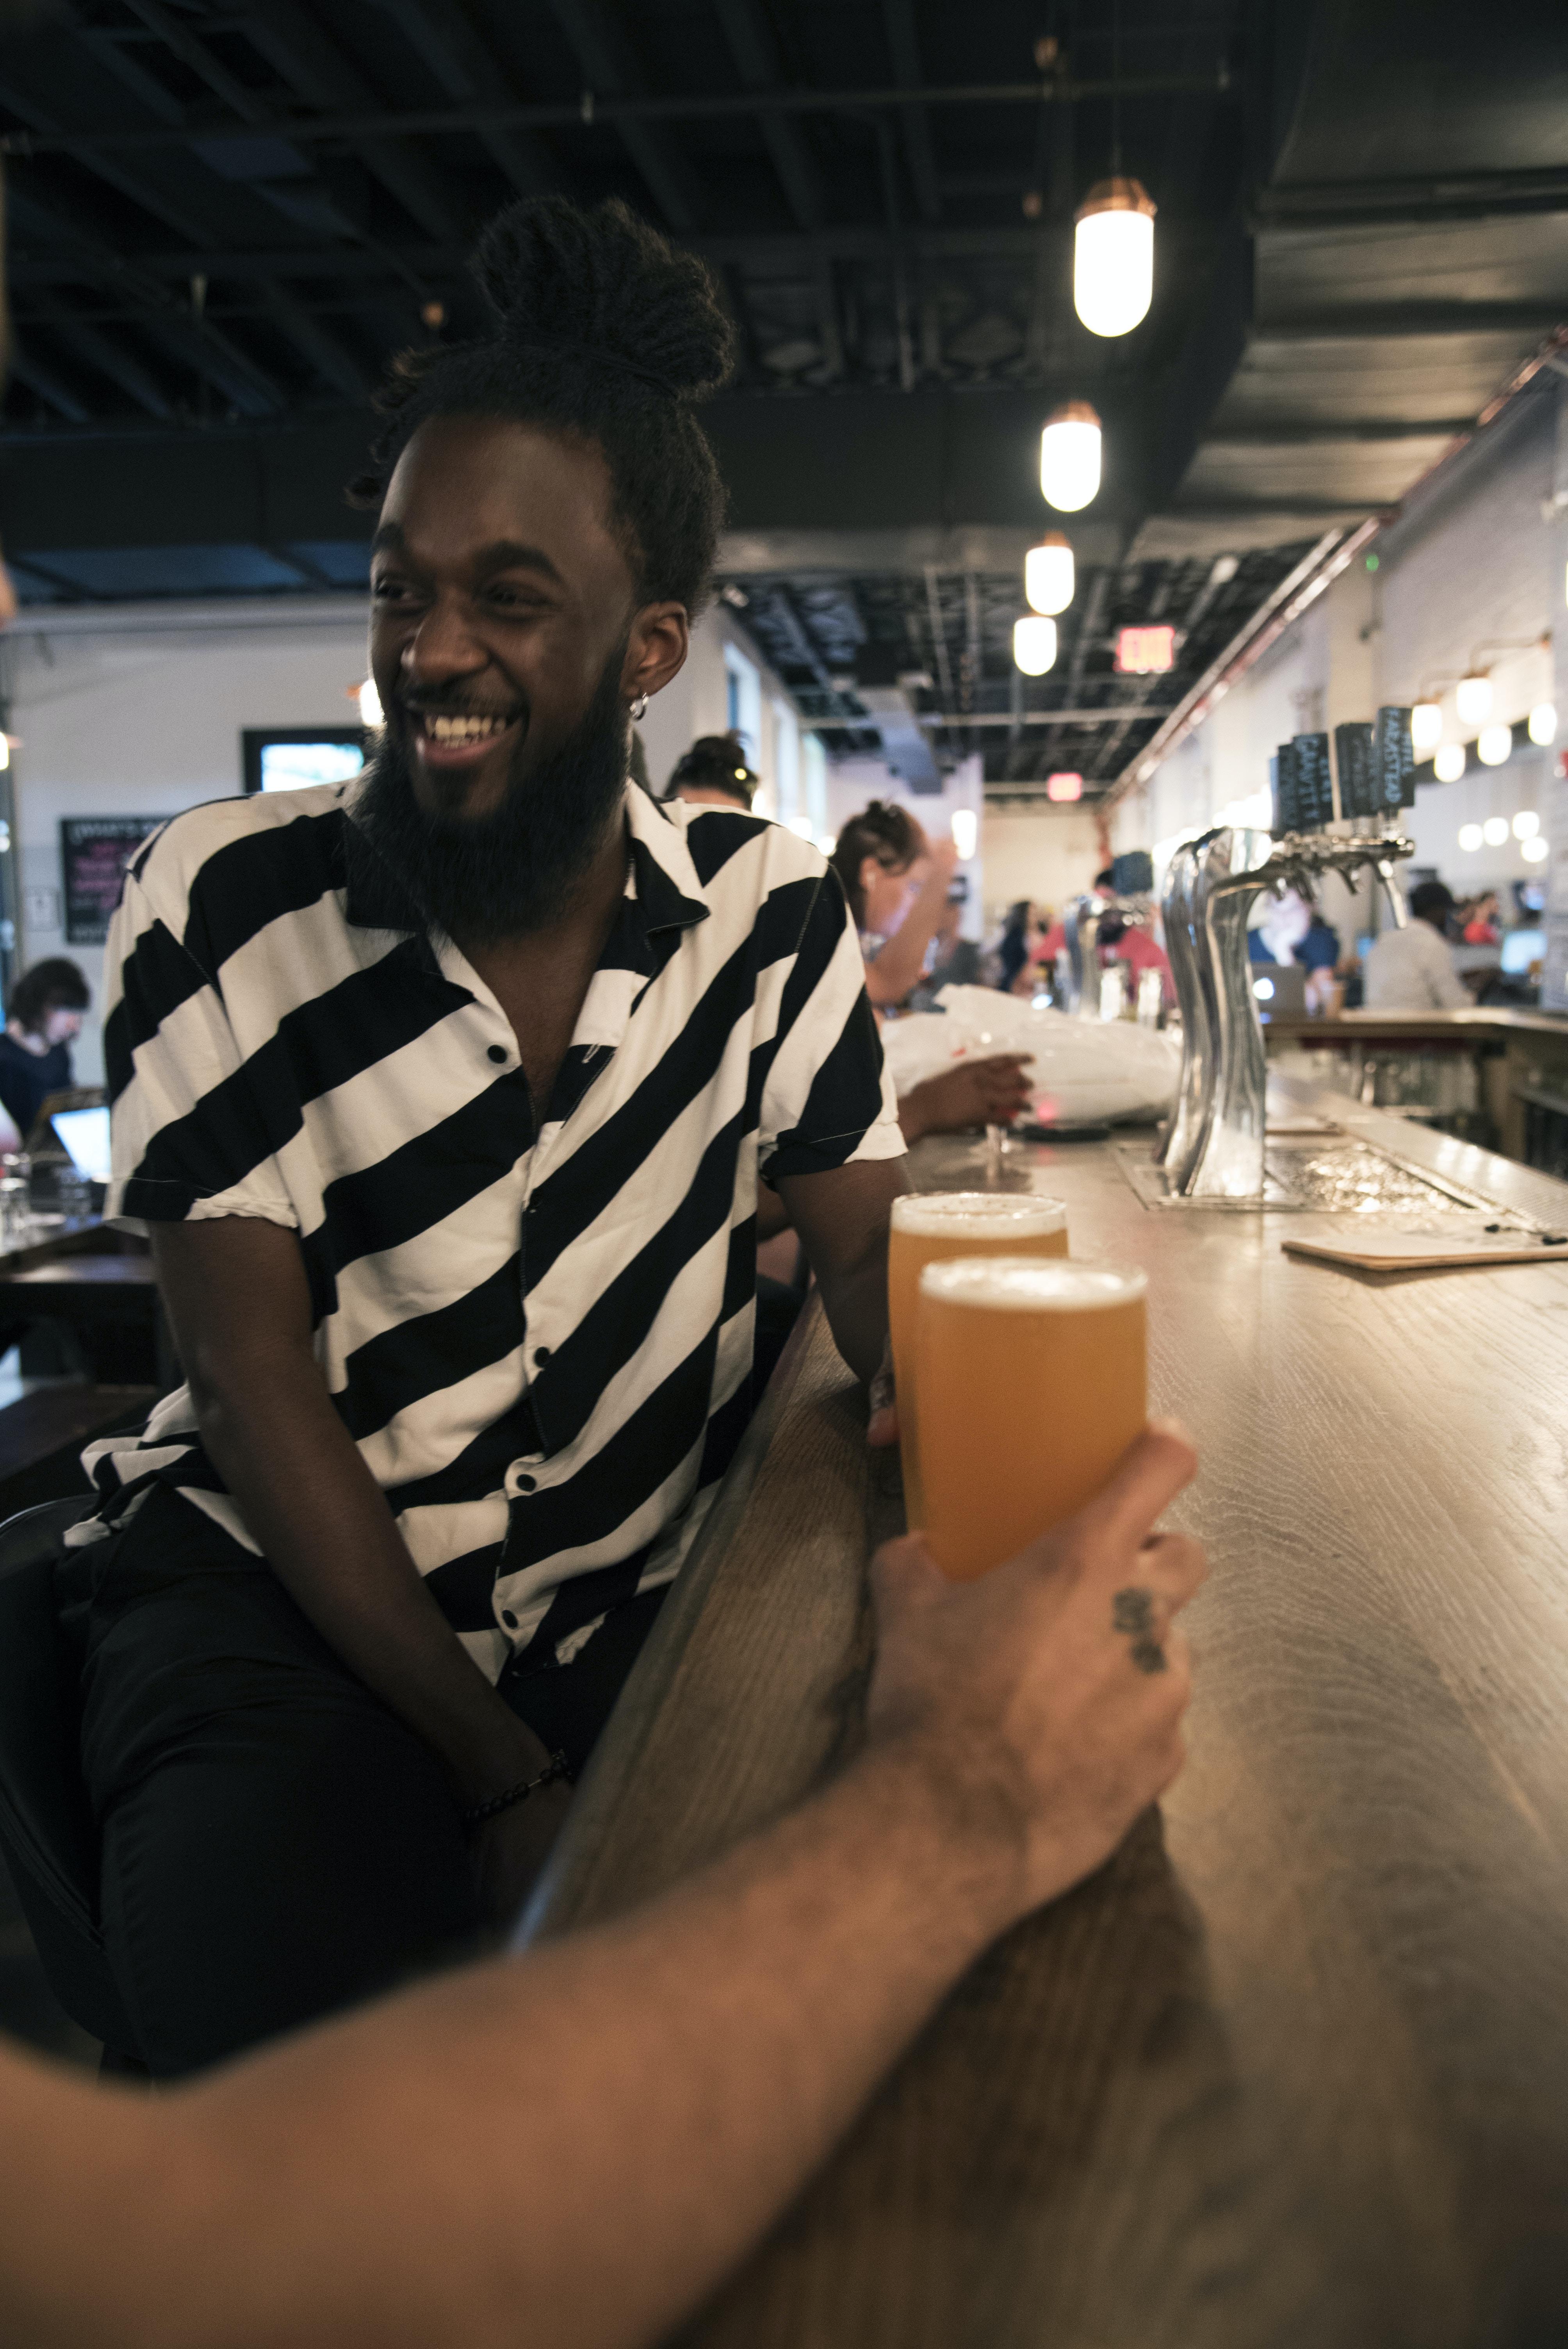 man sitting on stool in bar